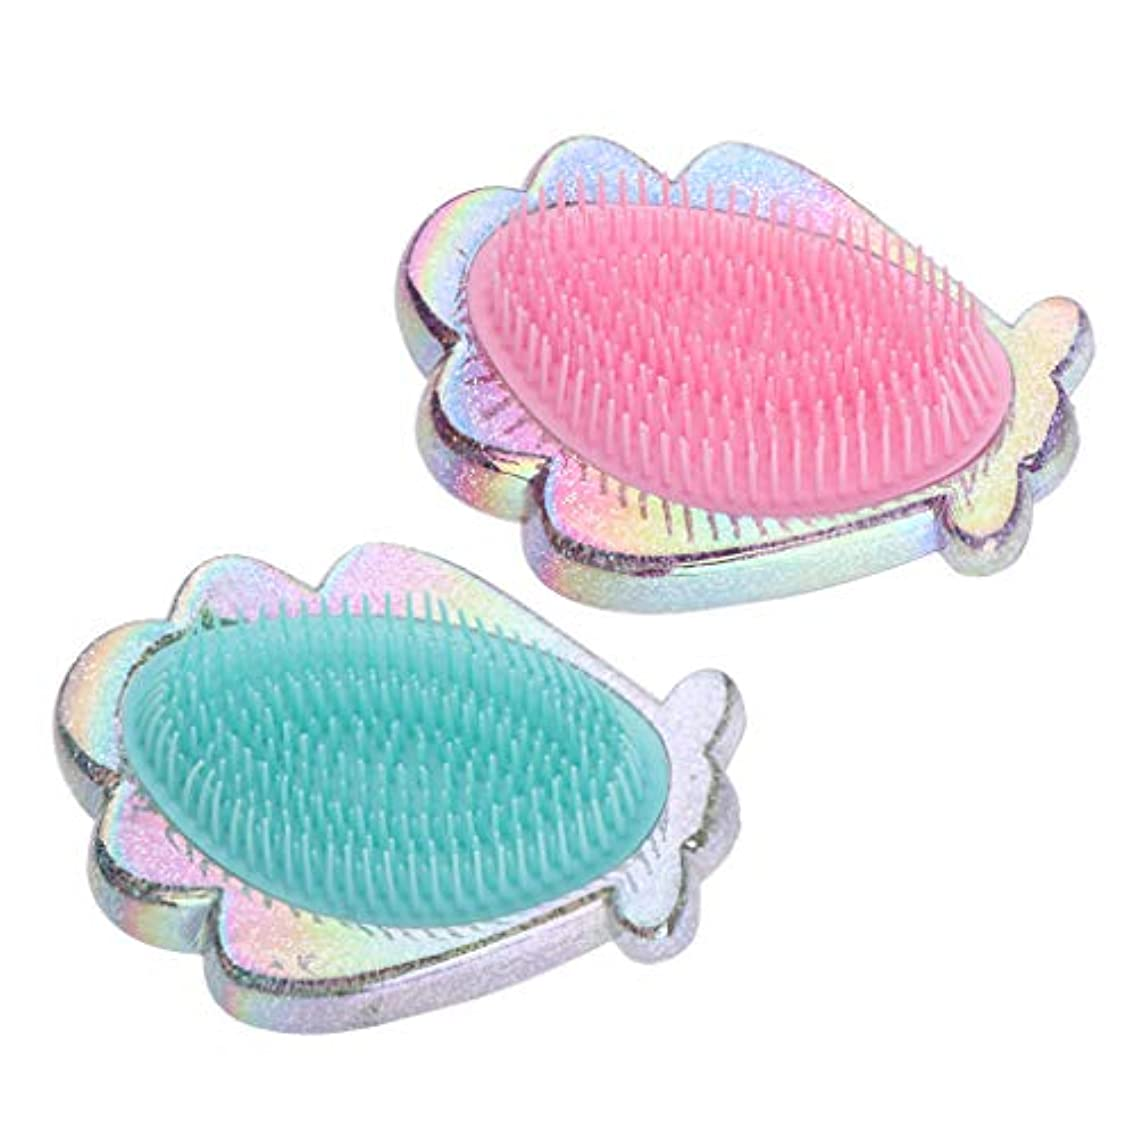 CUTICATE コーム ヘアコーム ヘアブラシ 静電気防止 プラスチック製 女性用 2個パック